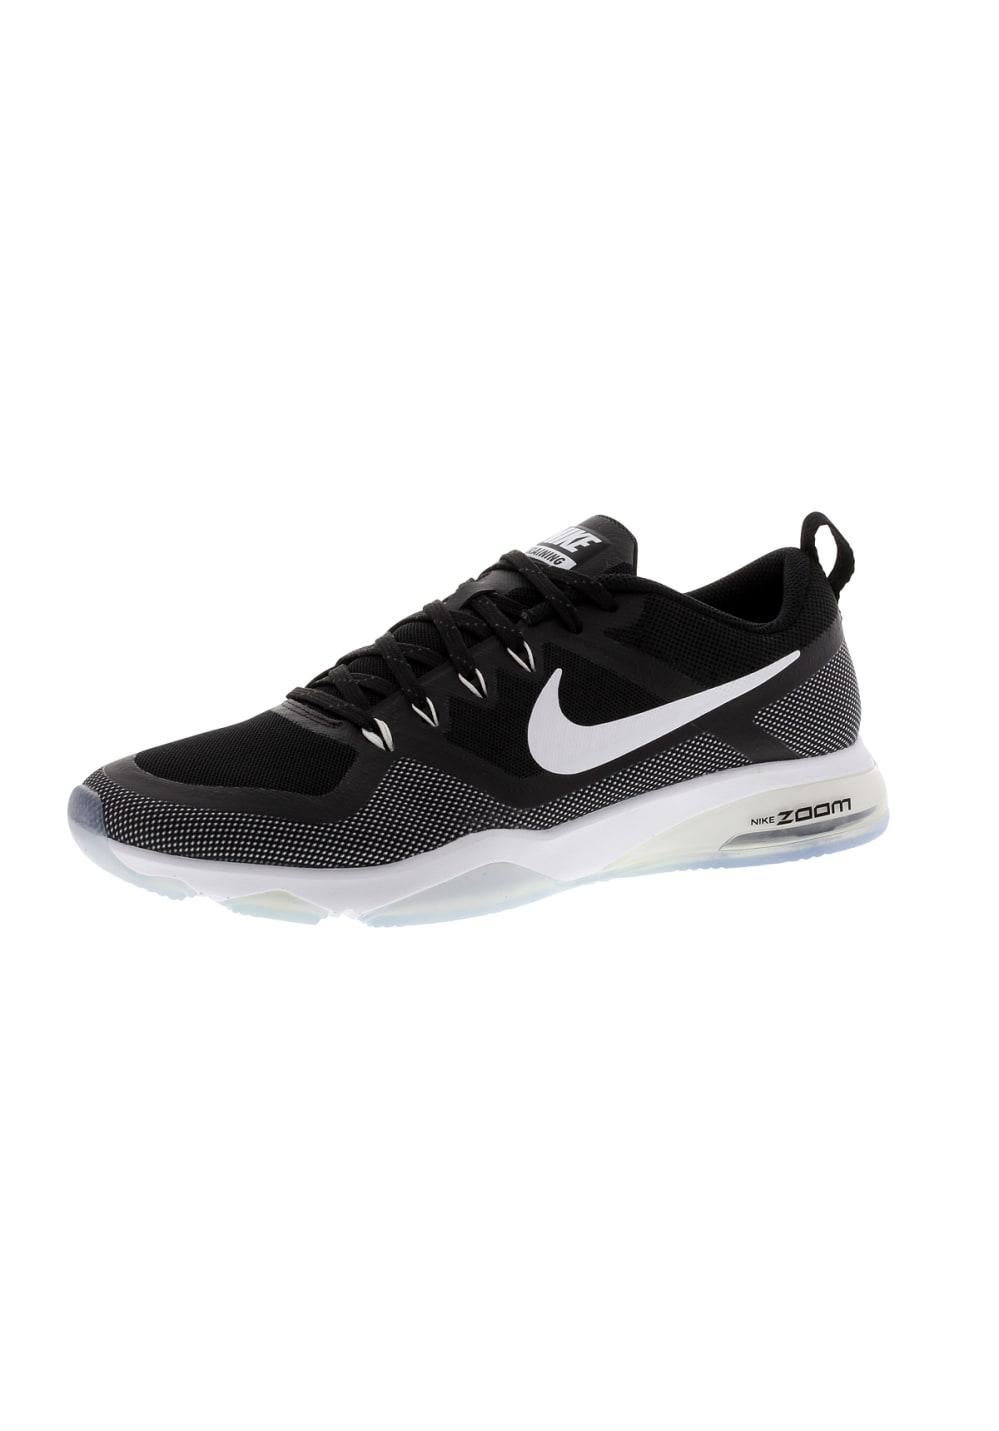 ed2258024318 Nike Zoom Fitness - Fitness shoes for Women - Black